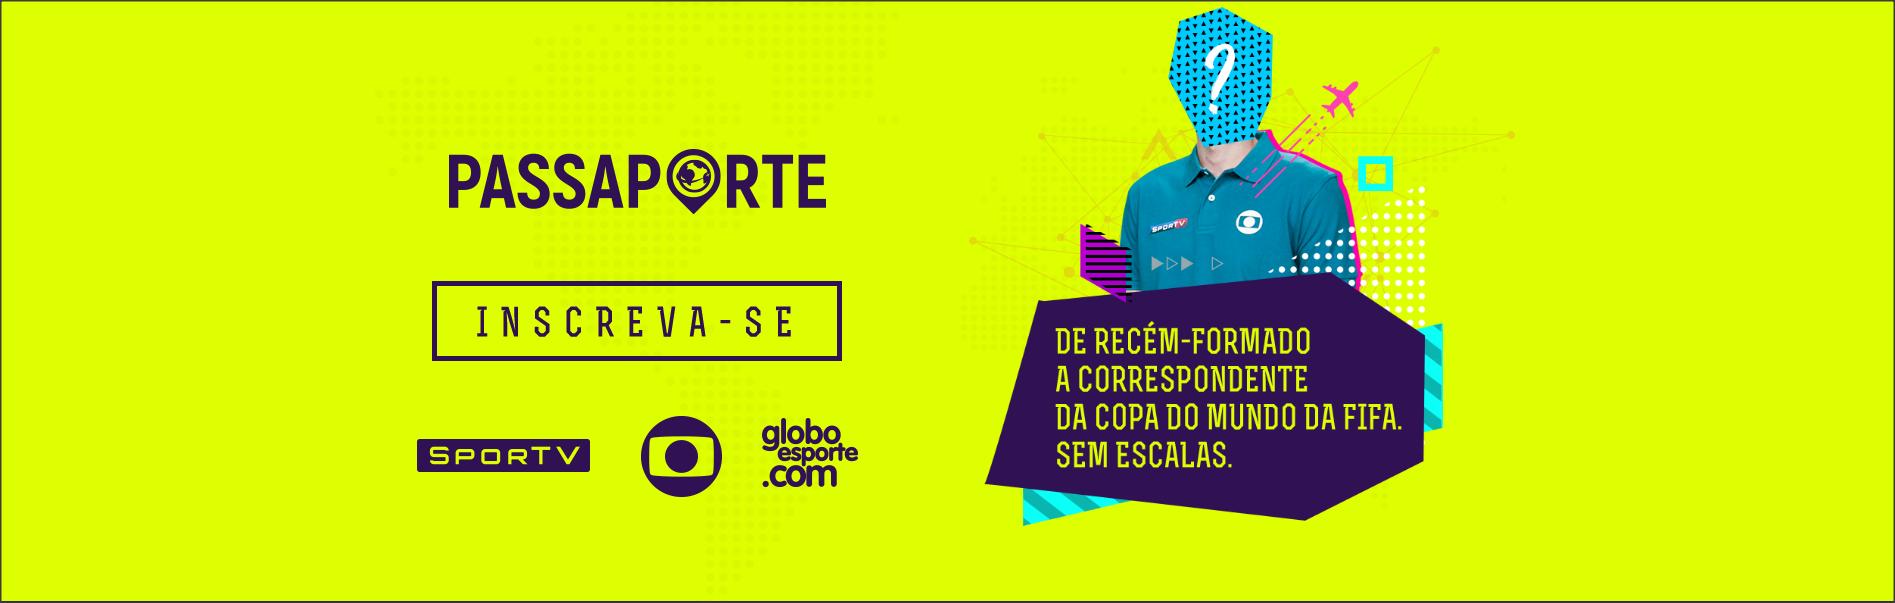 Passaporte SporTV